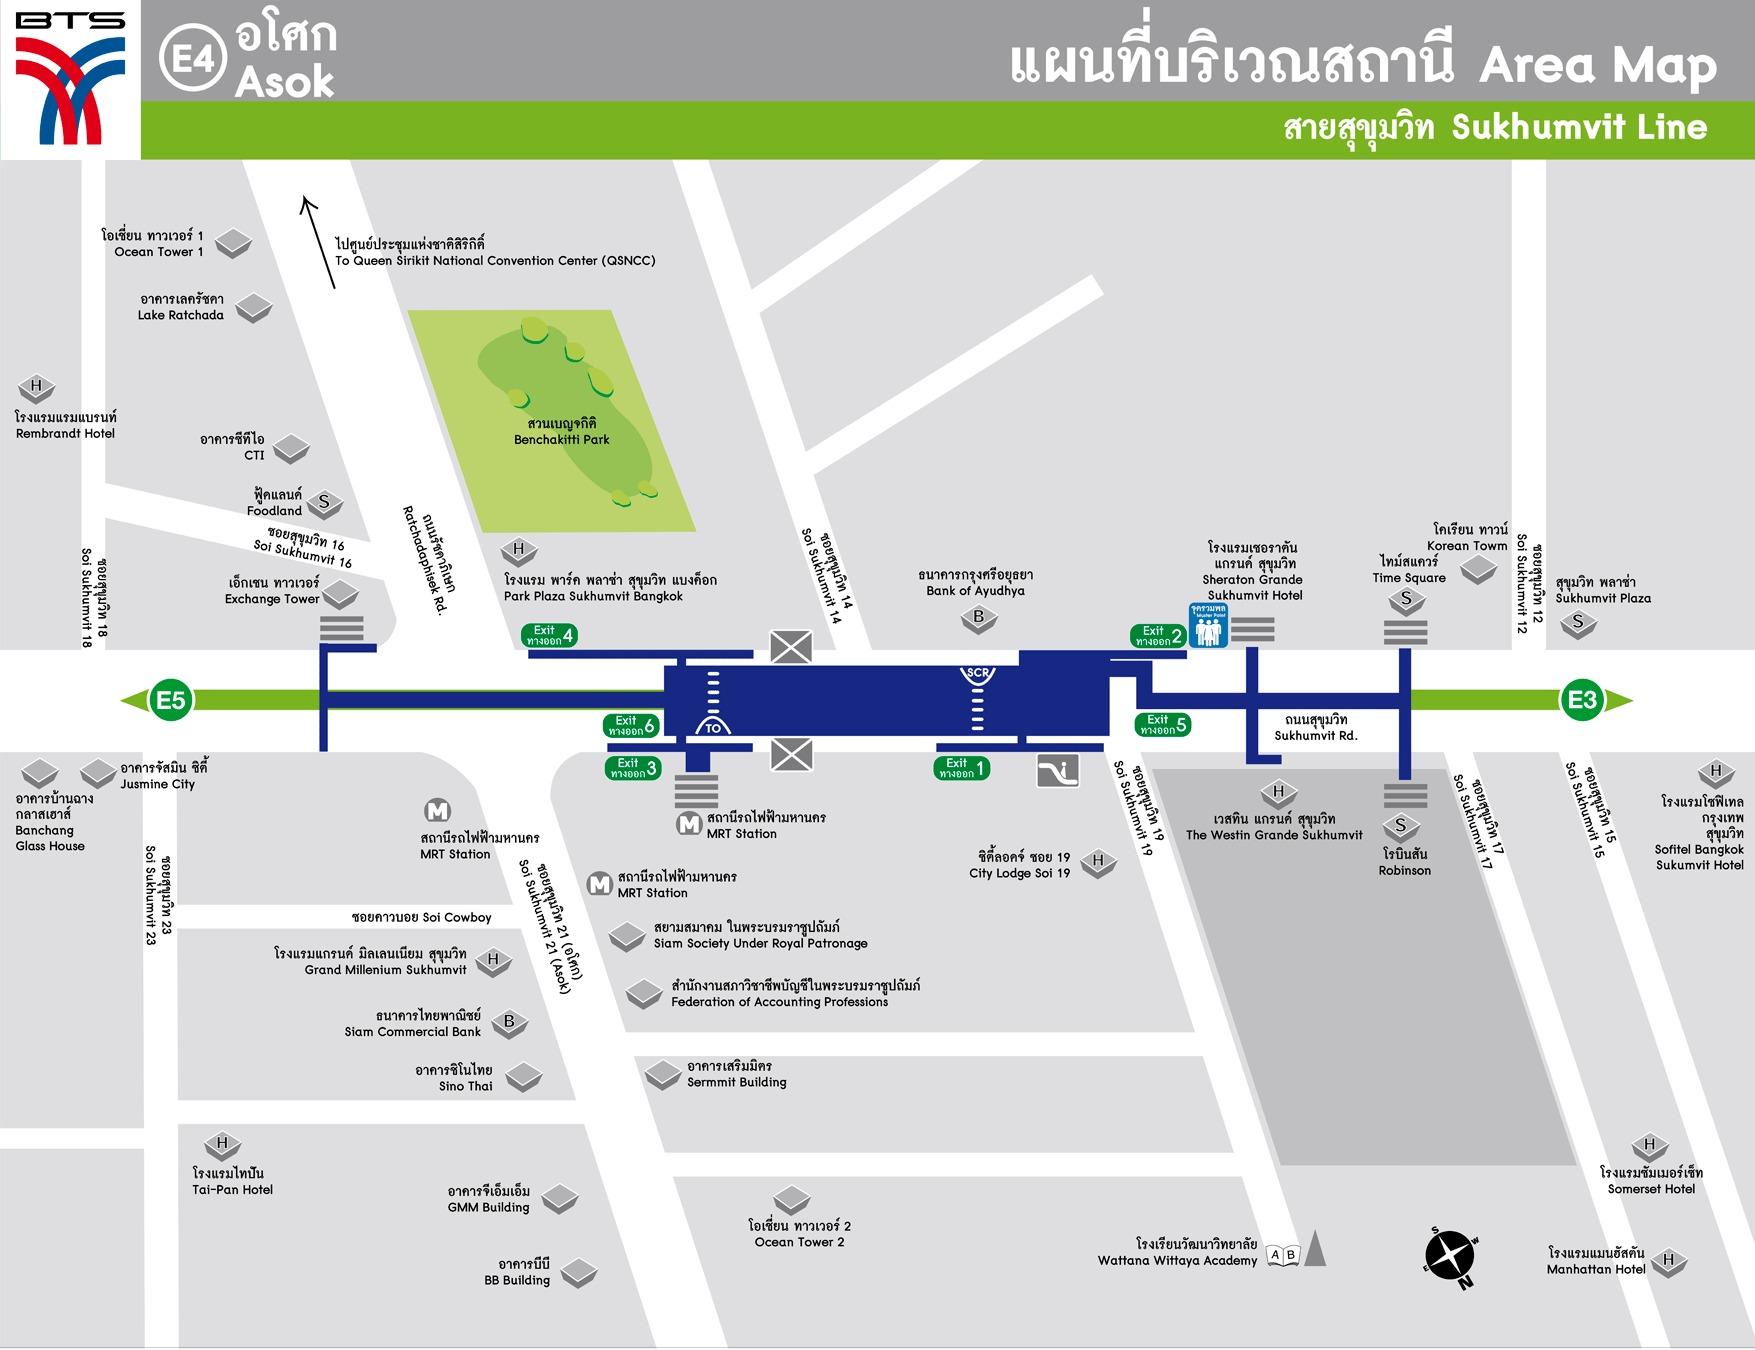 Asok Bts Station Map